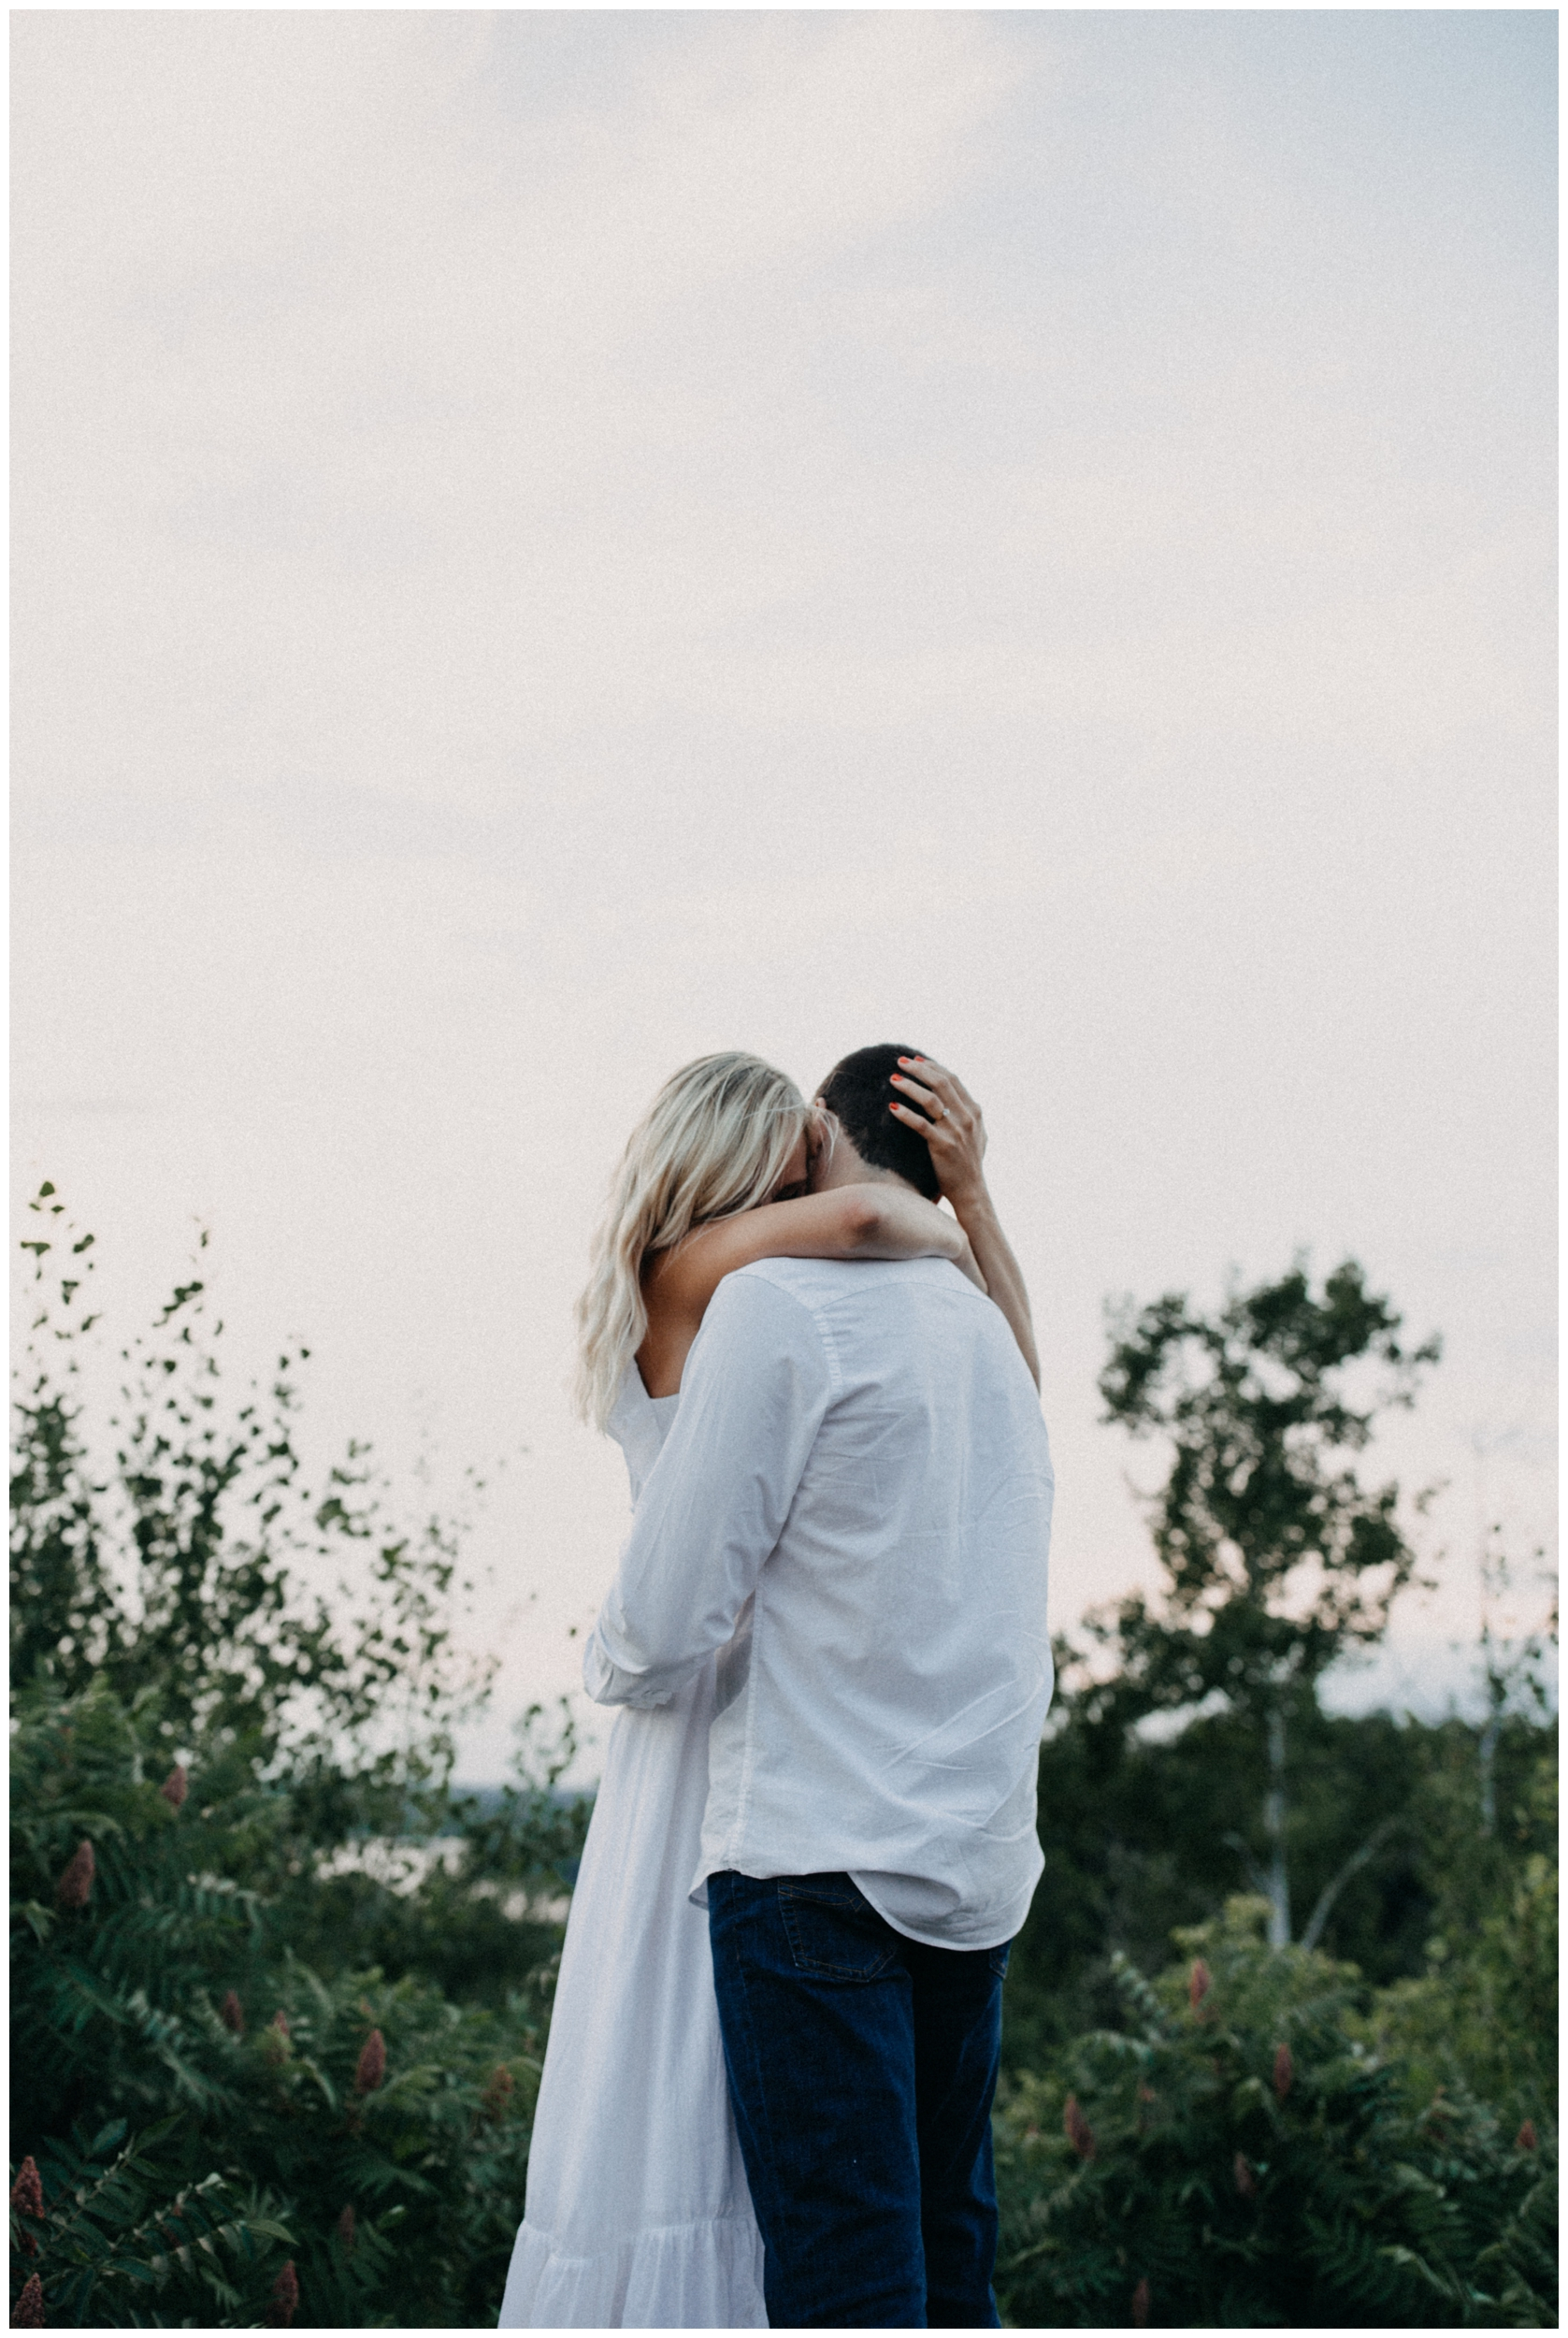 Romantic summer engagement session by Brainerd Minnesota photographer Britt DeZeeuw